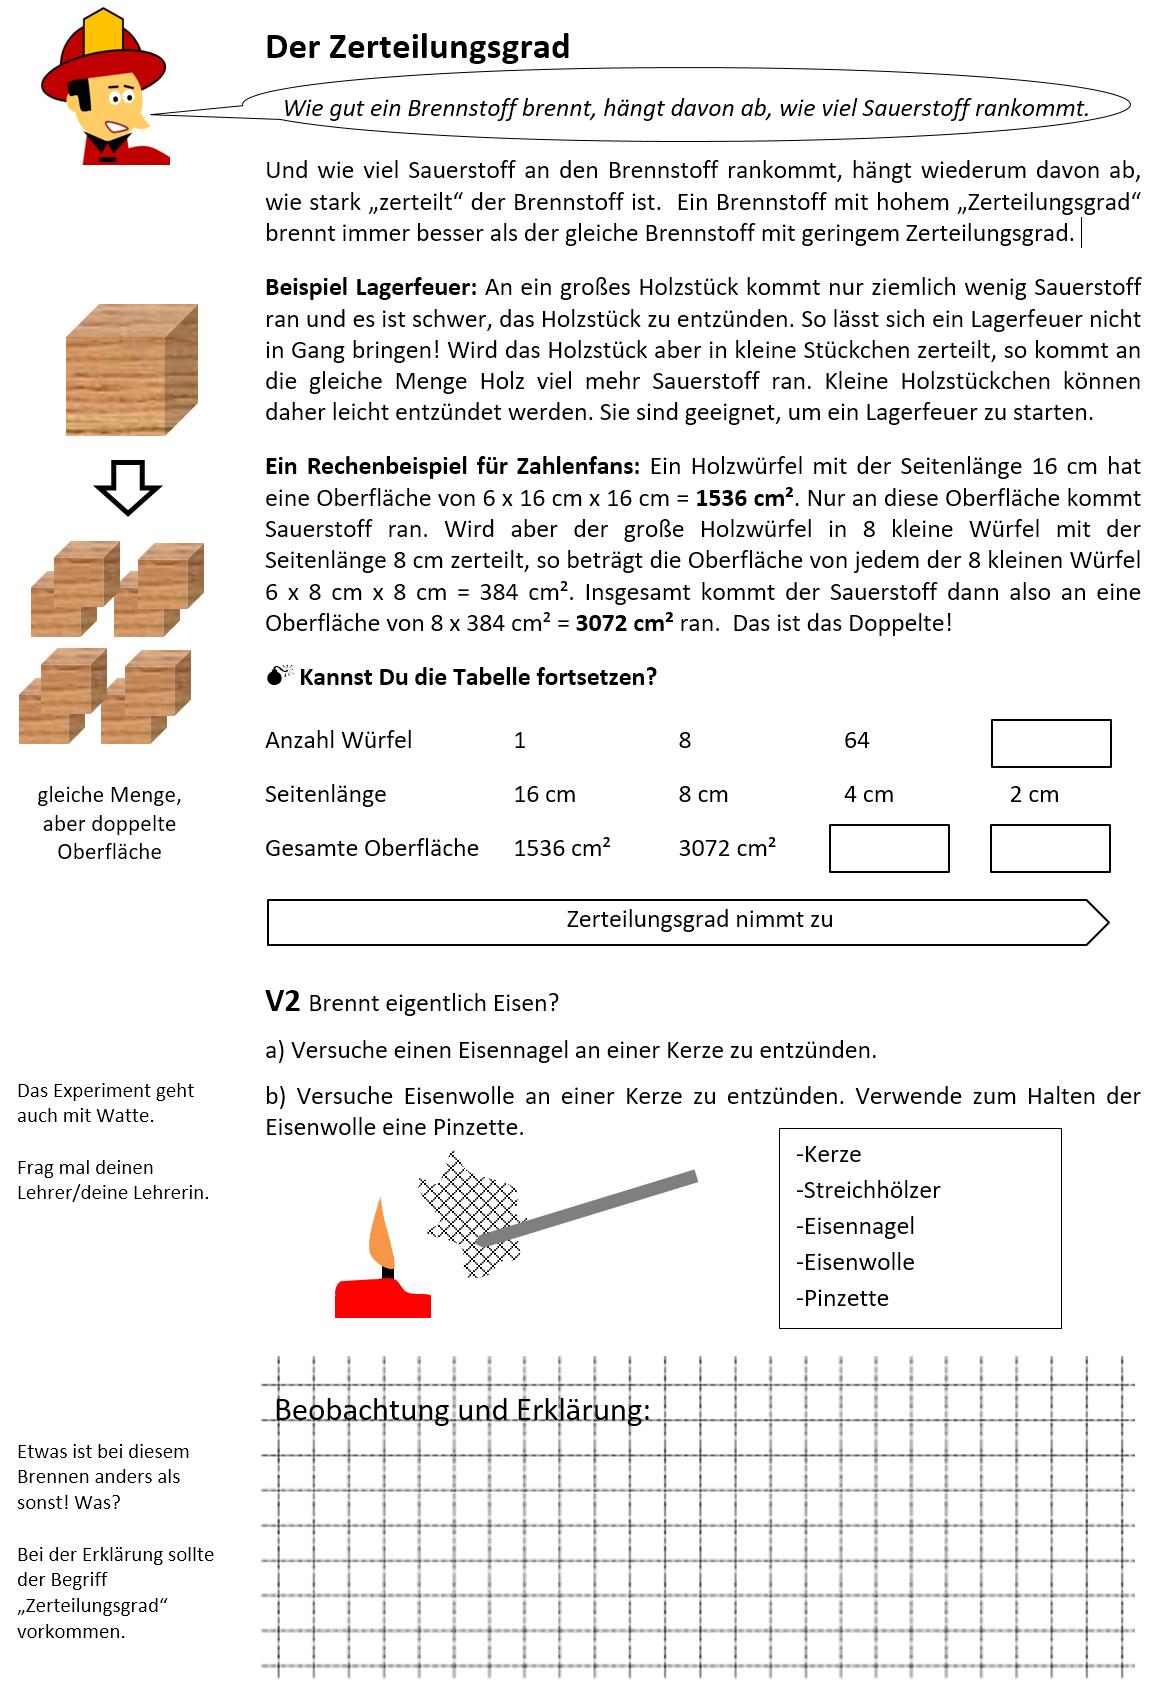 Großartig Objektive Und Subjektive Sprache Arbeitsblatt Bilder ...